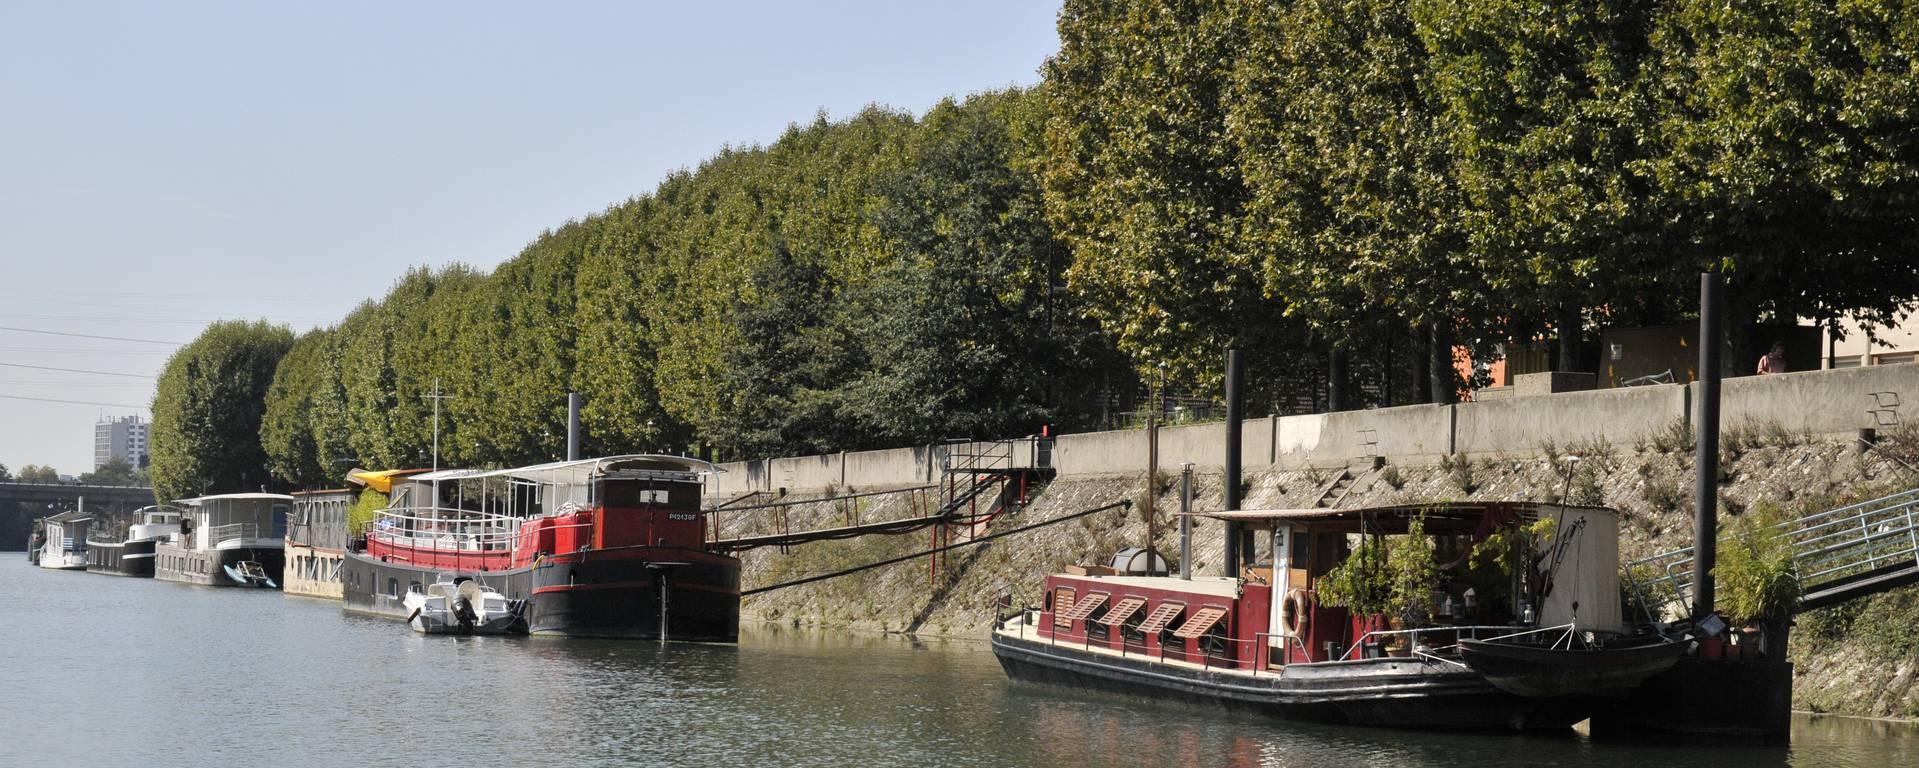 Péniches en bord de Seine - © Valerie Evrard